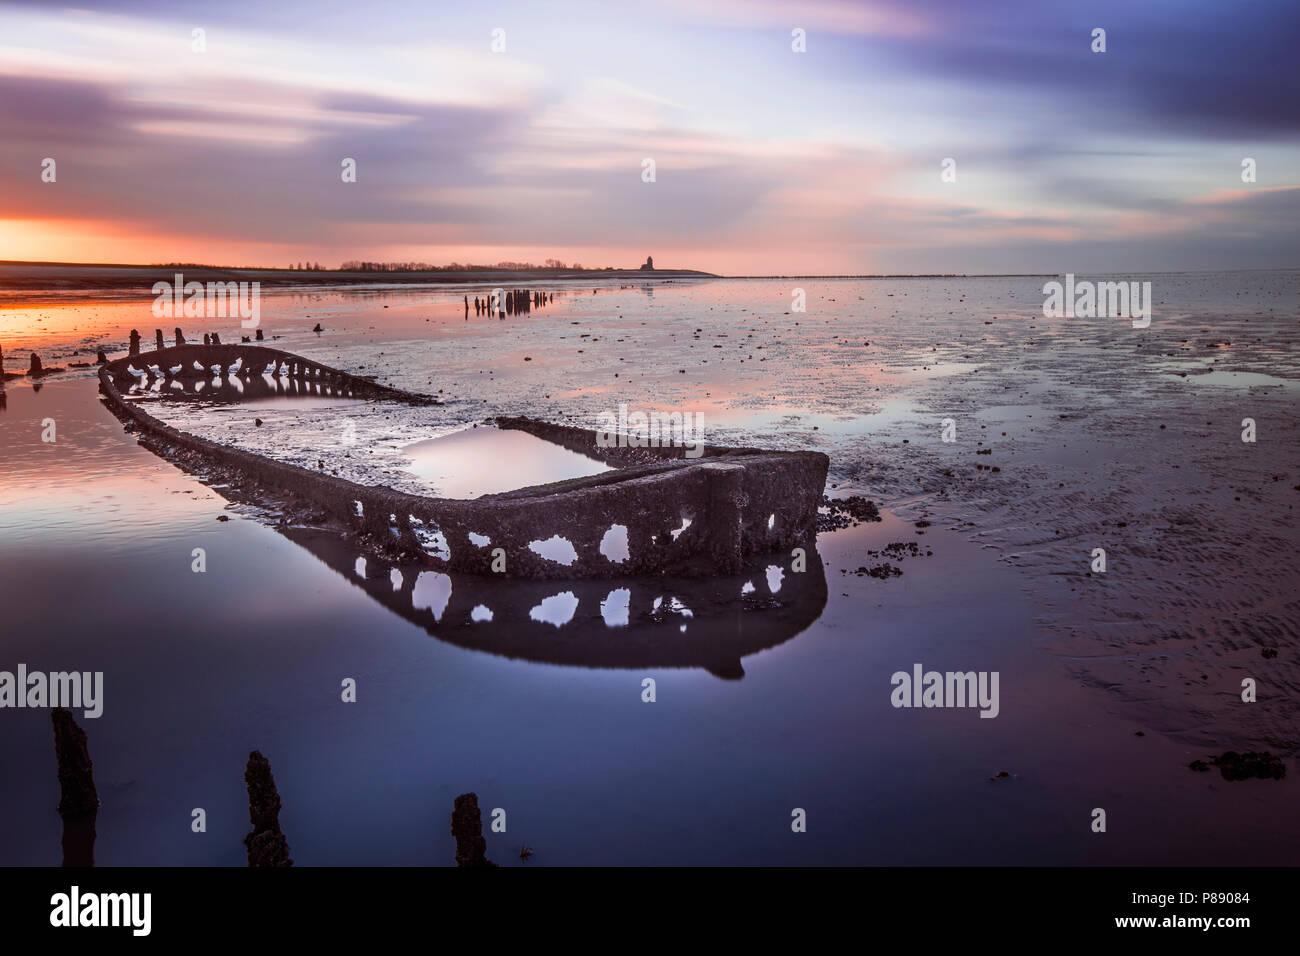 Scheepswrak; Ship wreck Stock Photo